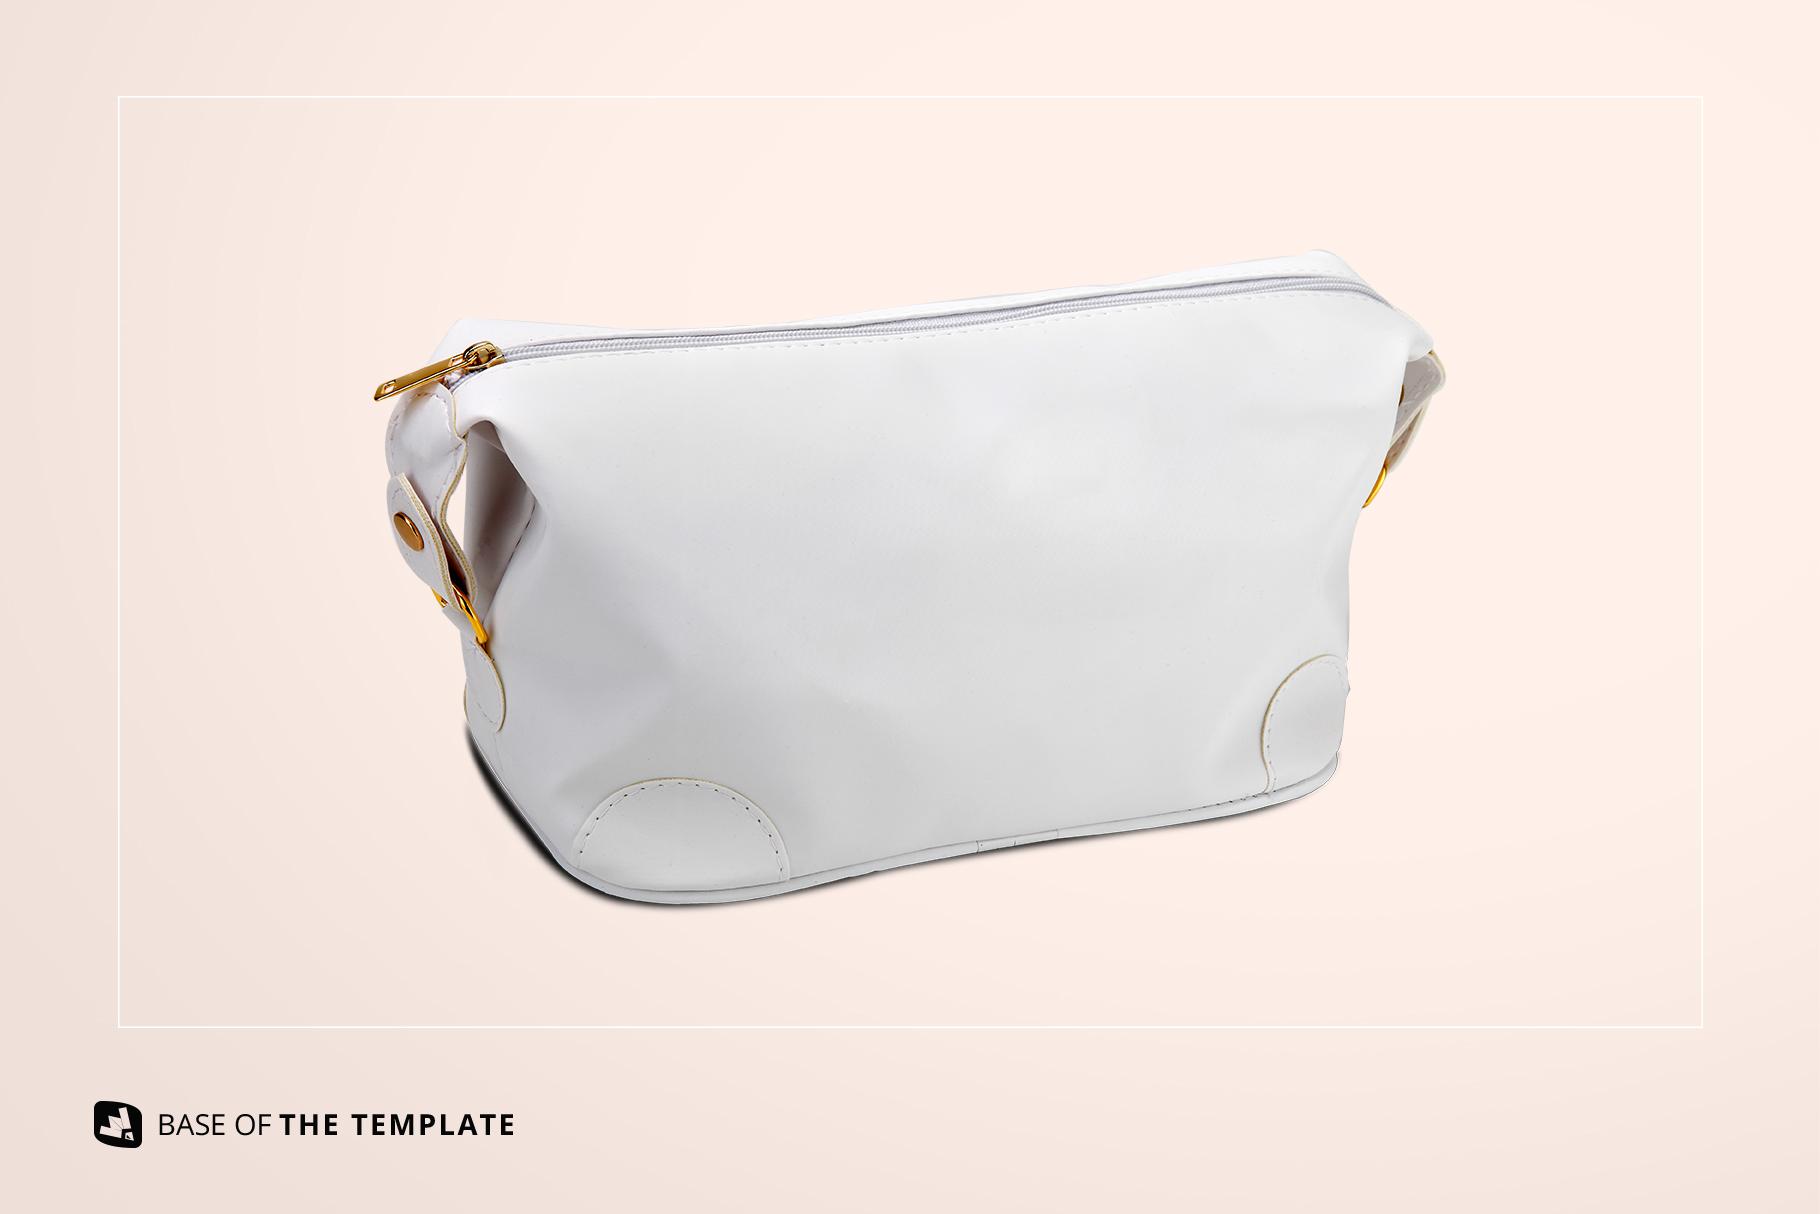 base image of the leather makeup bag mockup